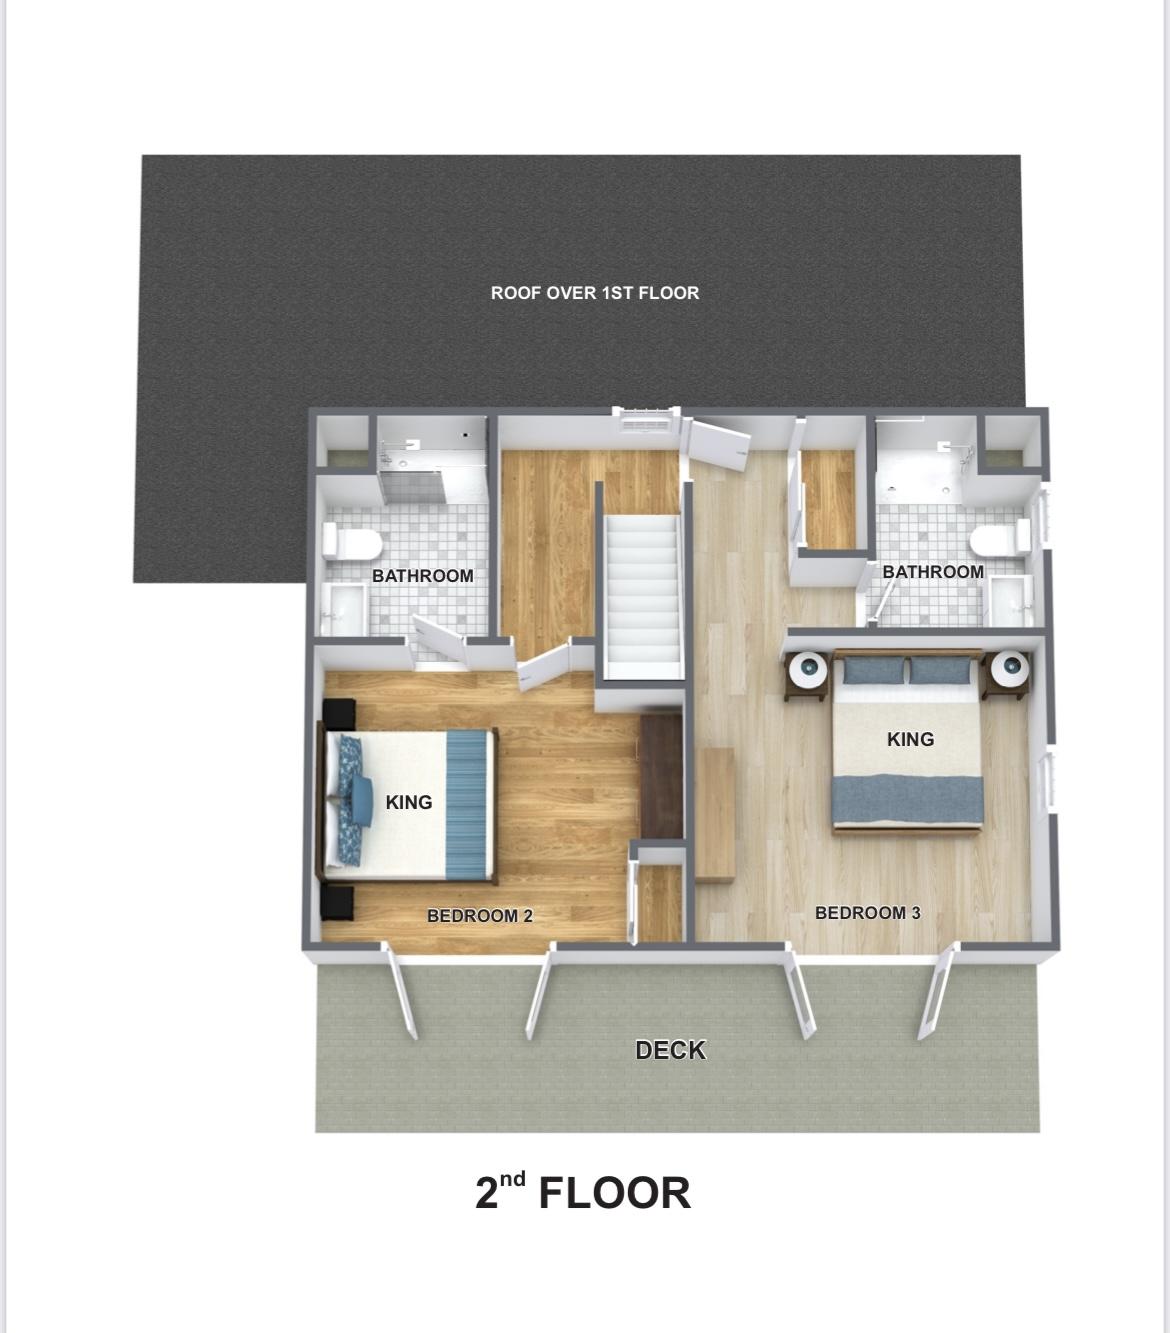 2nd floor plan furnished